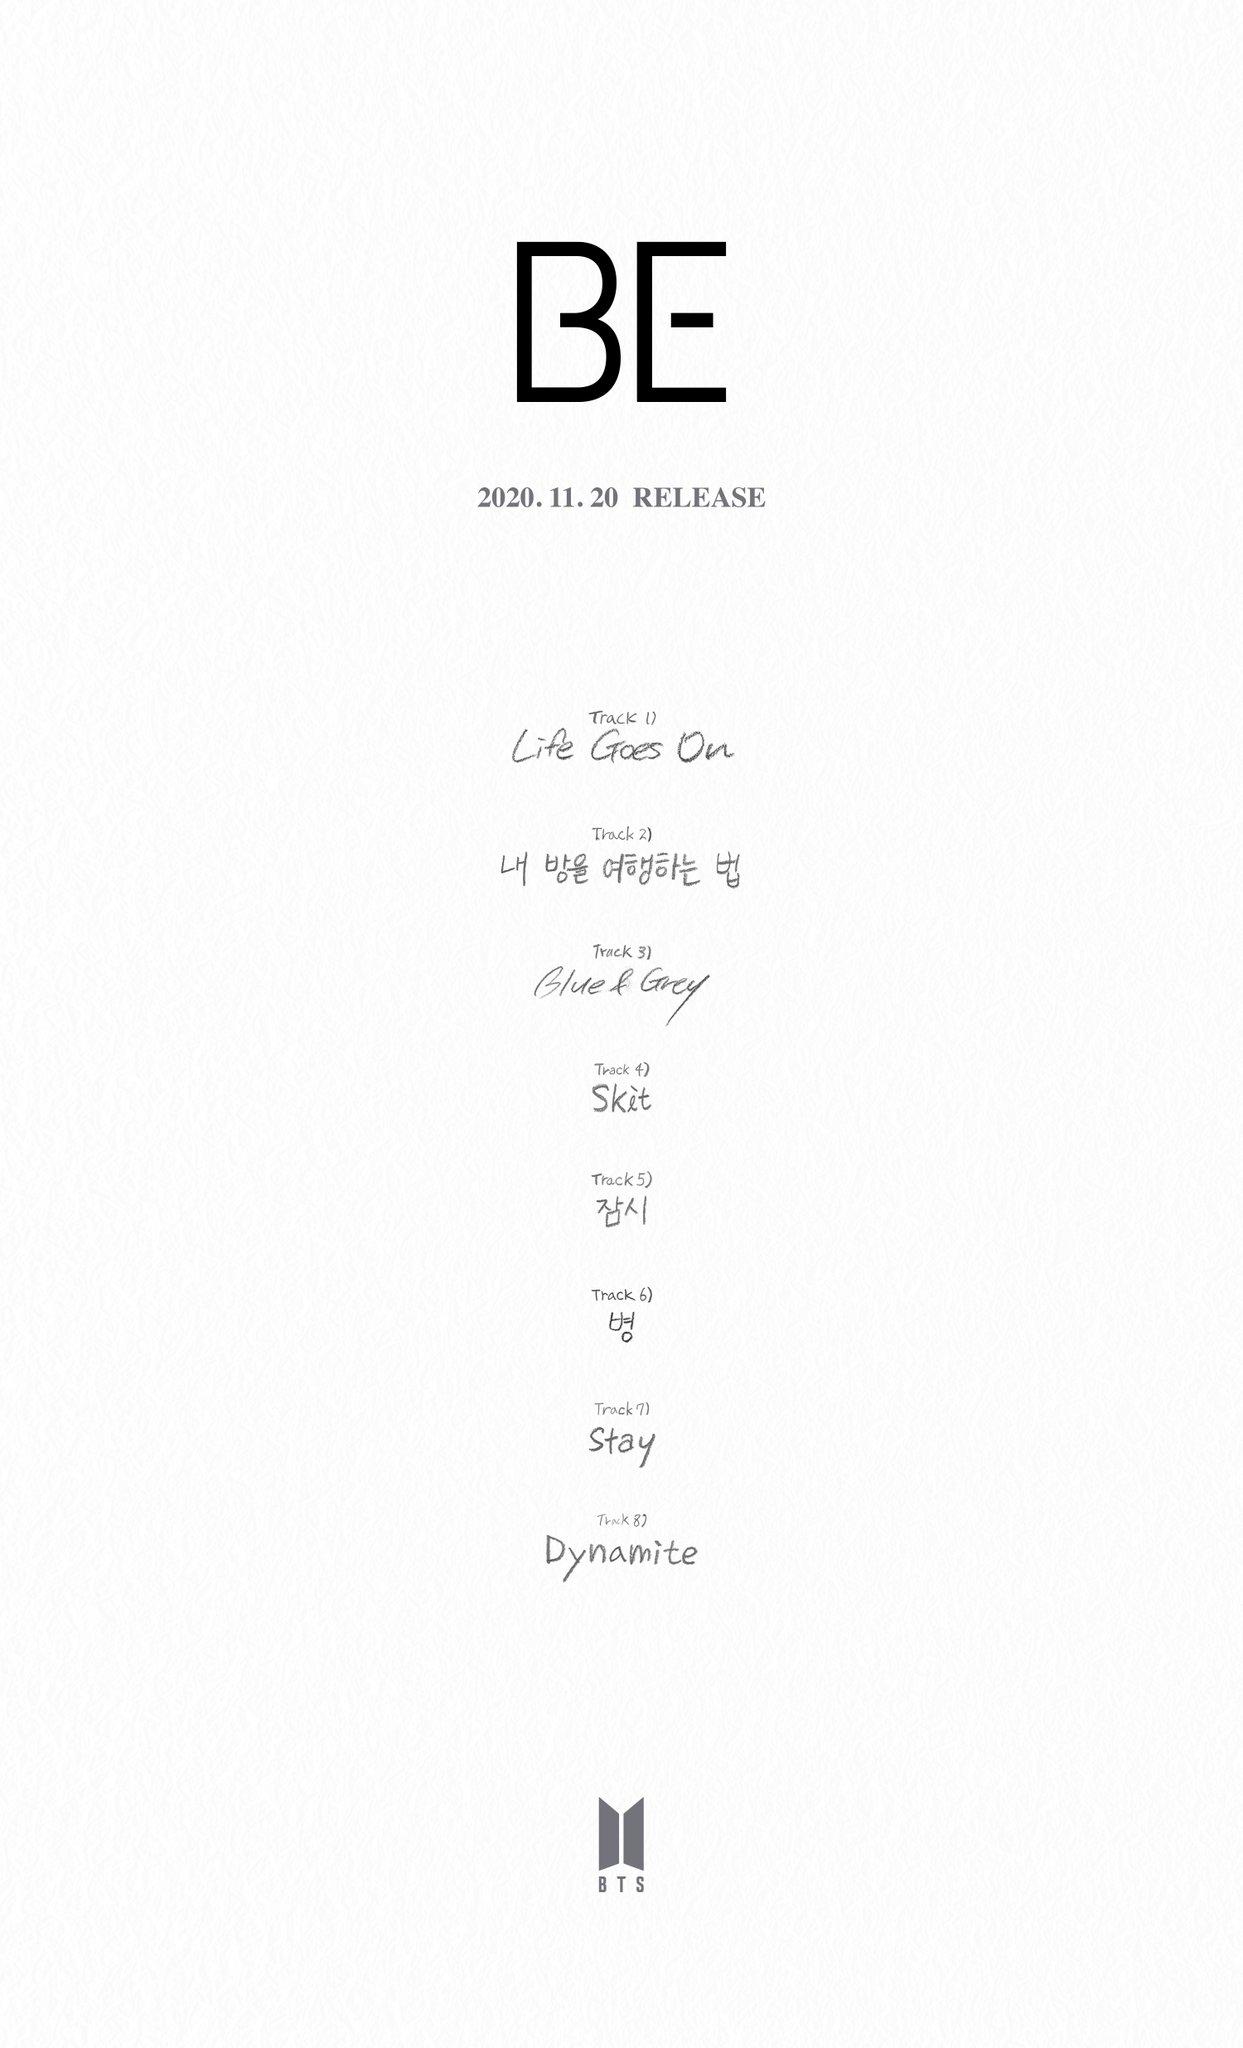 BTS Be Tracklist